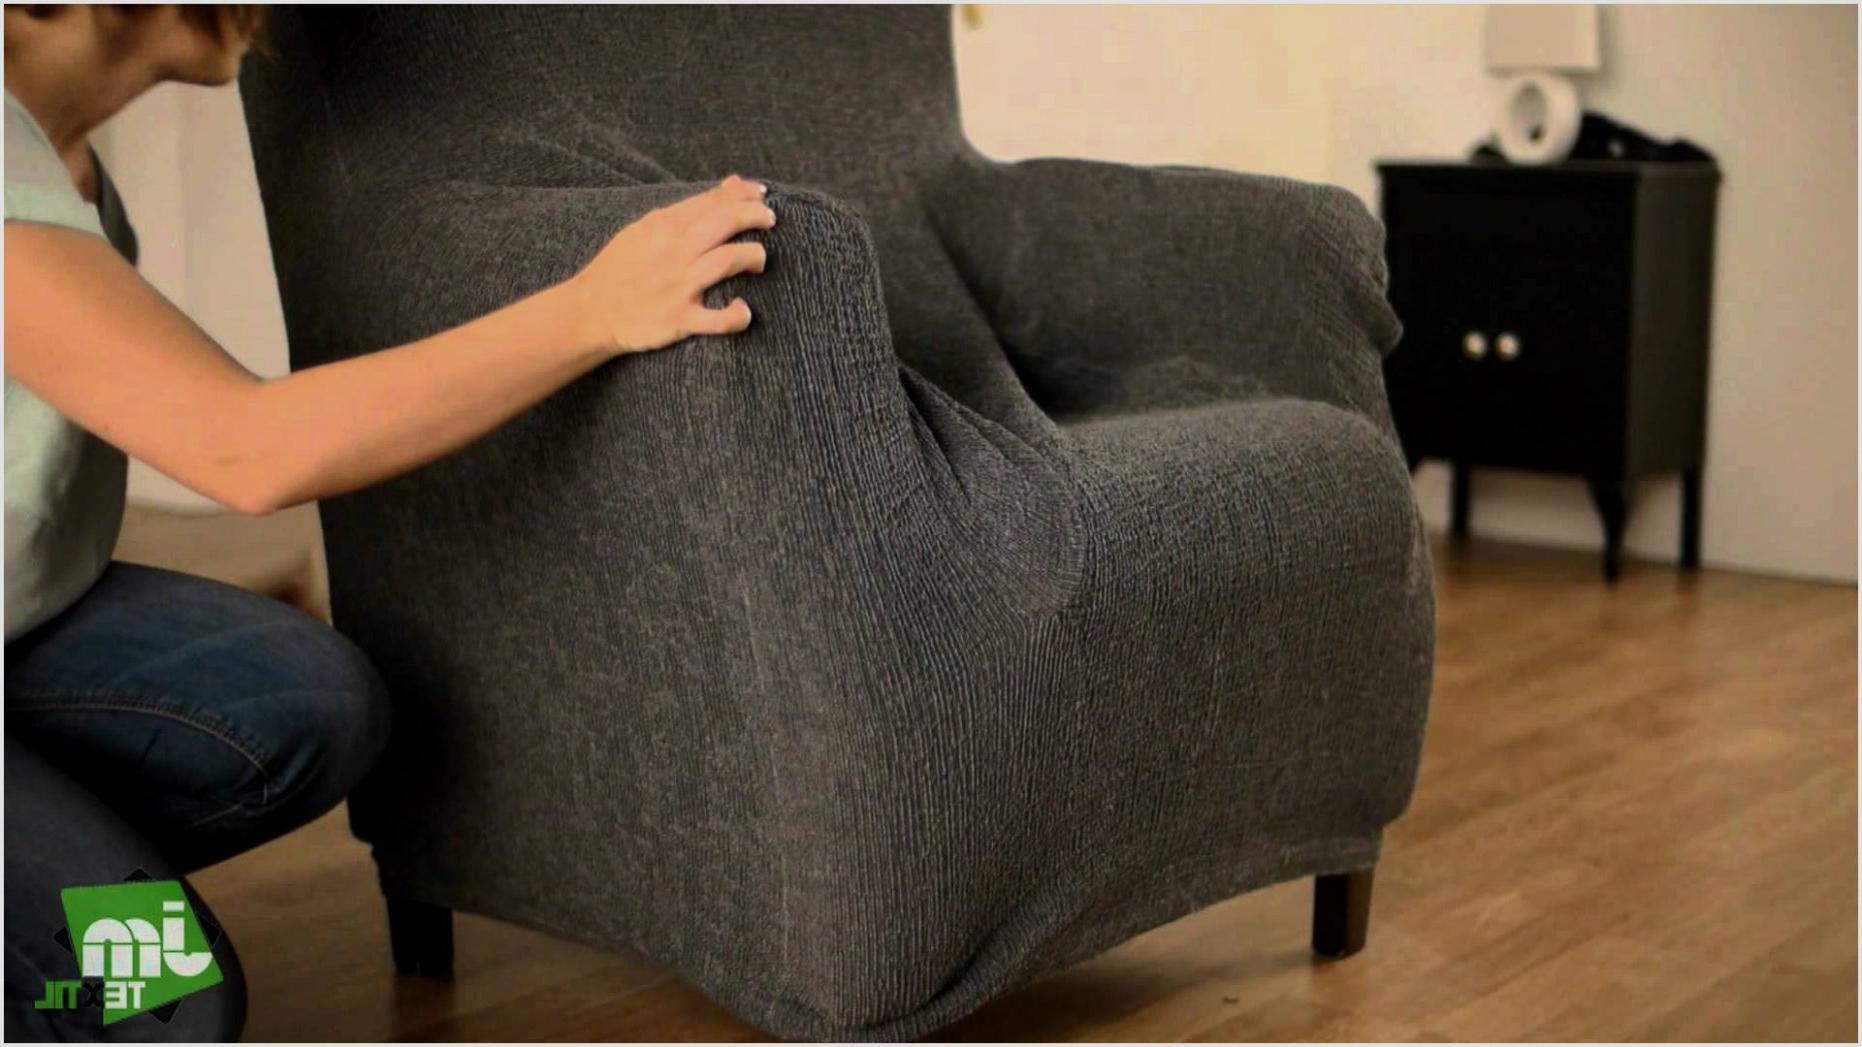 Fundas sofa Baratas Carrefour Gdd0 Sillon orejero Barato Especial 33 Contemporà Nea sofa Cama Barato